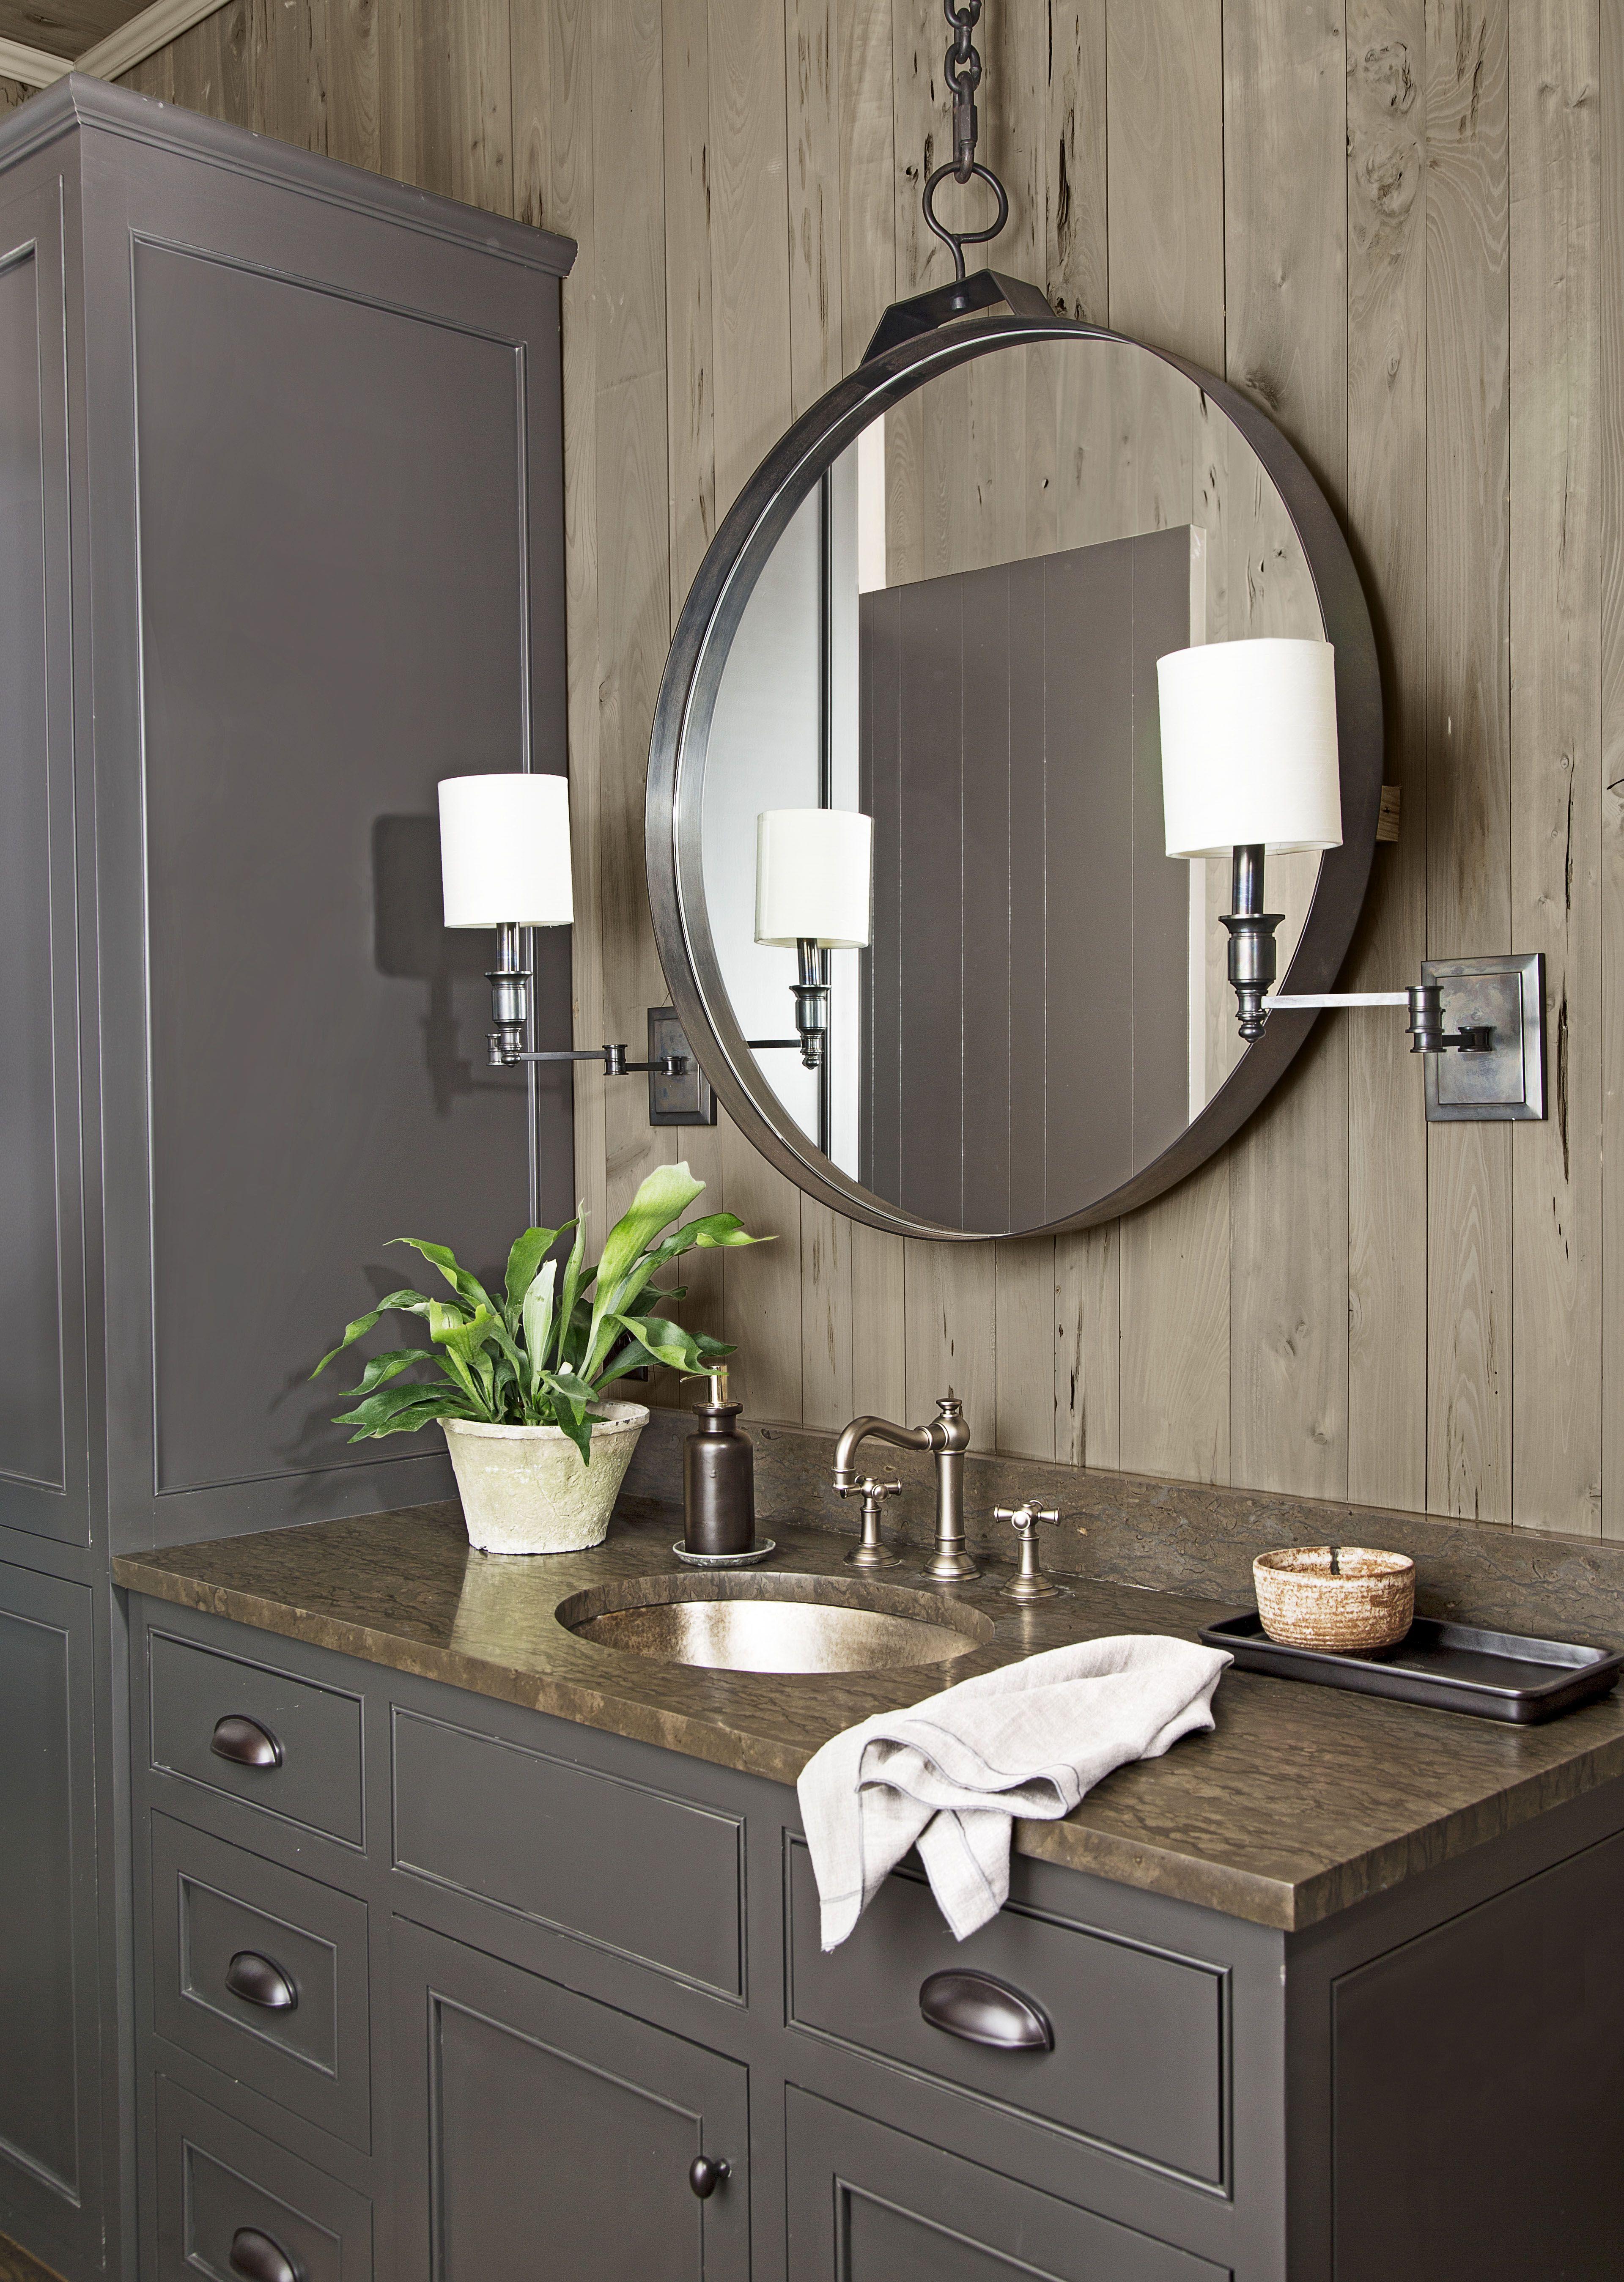 9 Best Bathroom Countertop Ideas - Bathroom Countertop Sink